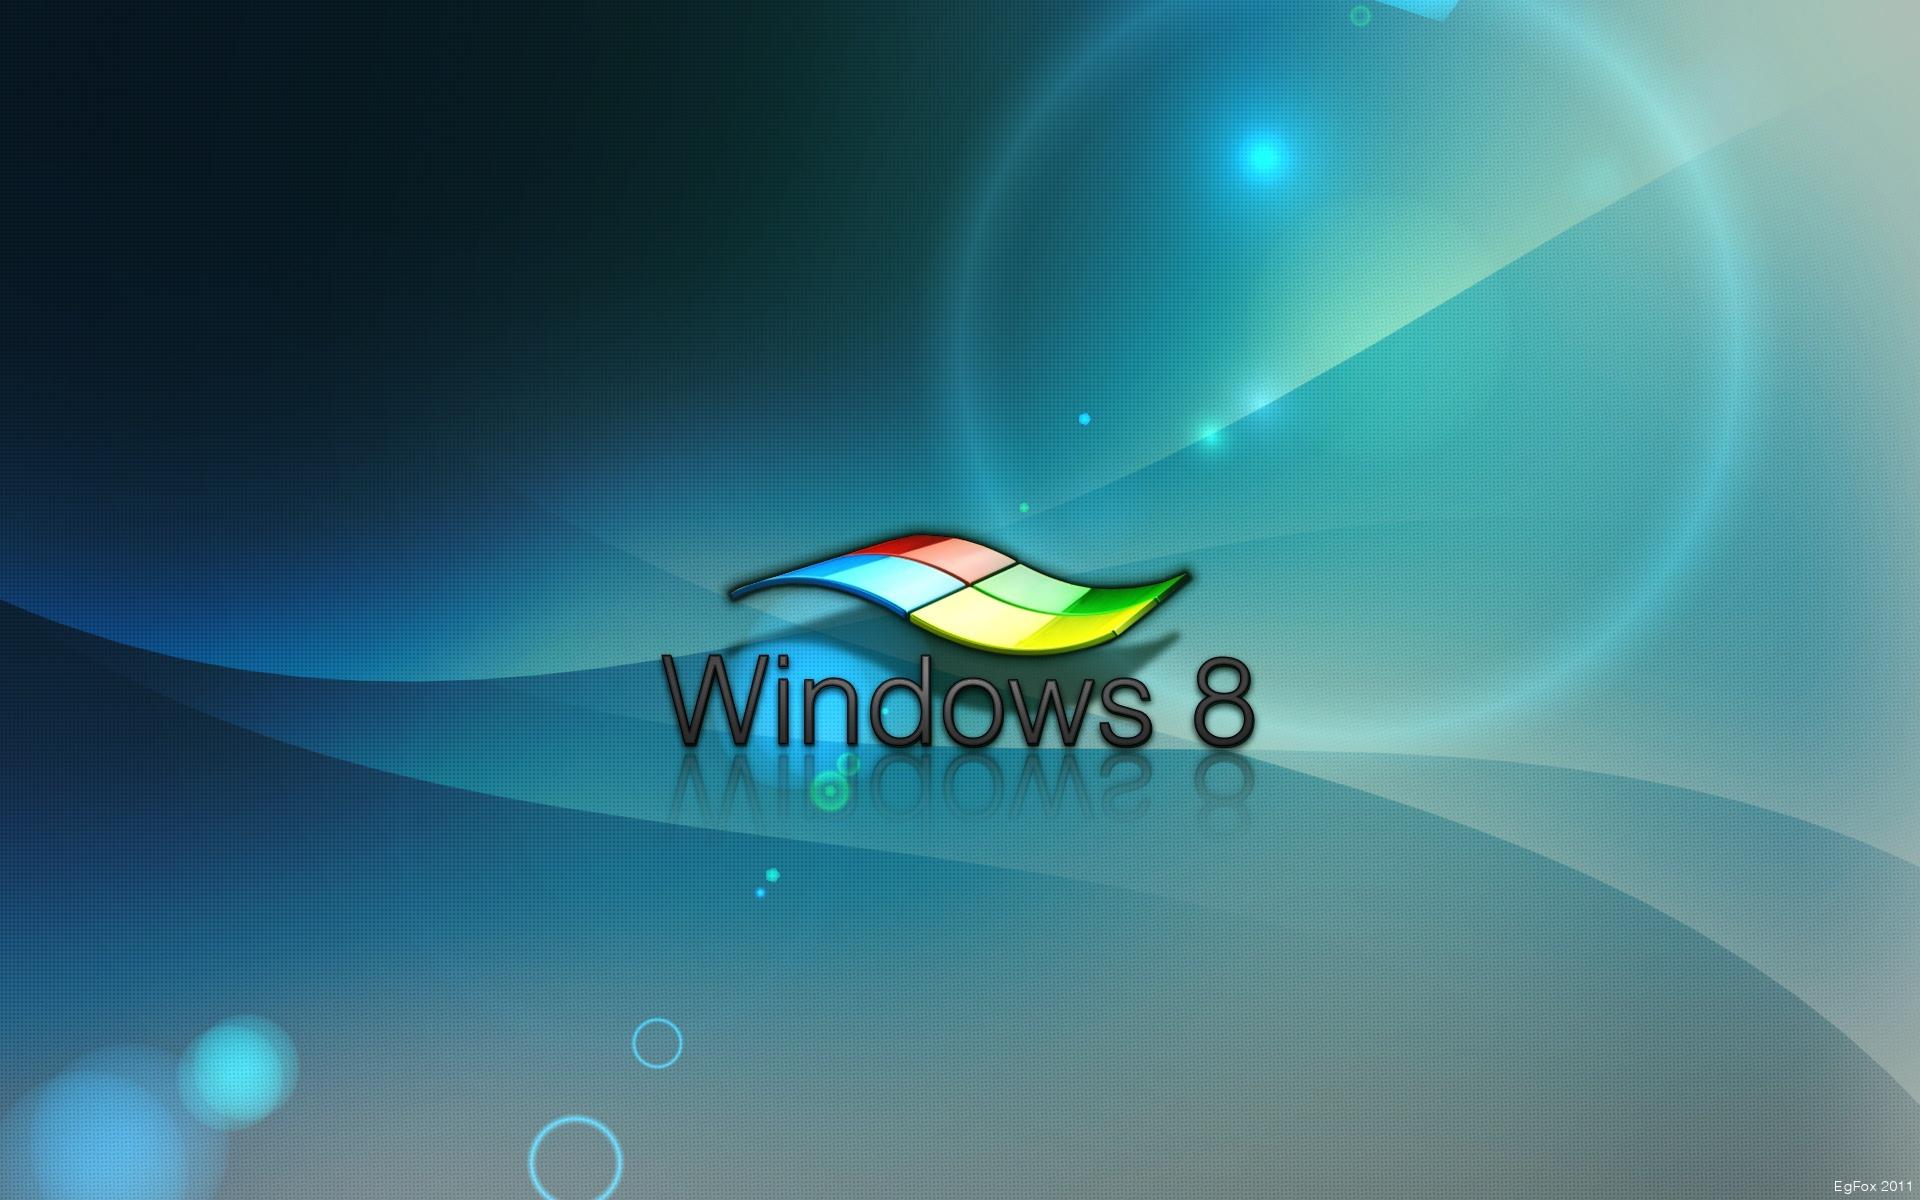 Download wallpaper 1920x1200 3d effects of windows 8 hd for 3d effect wallpaper